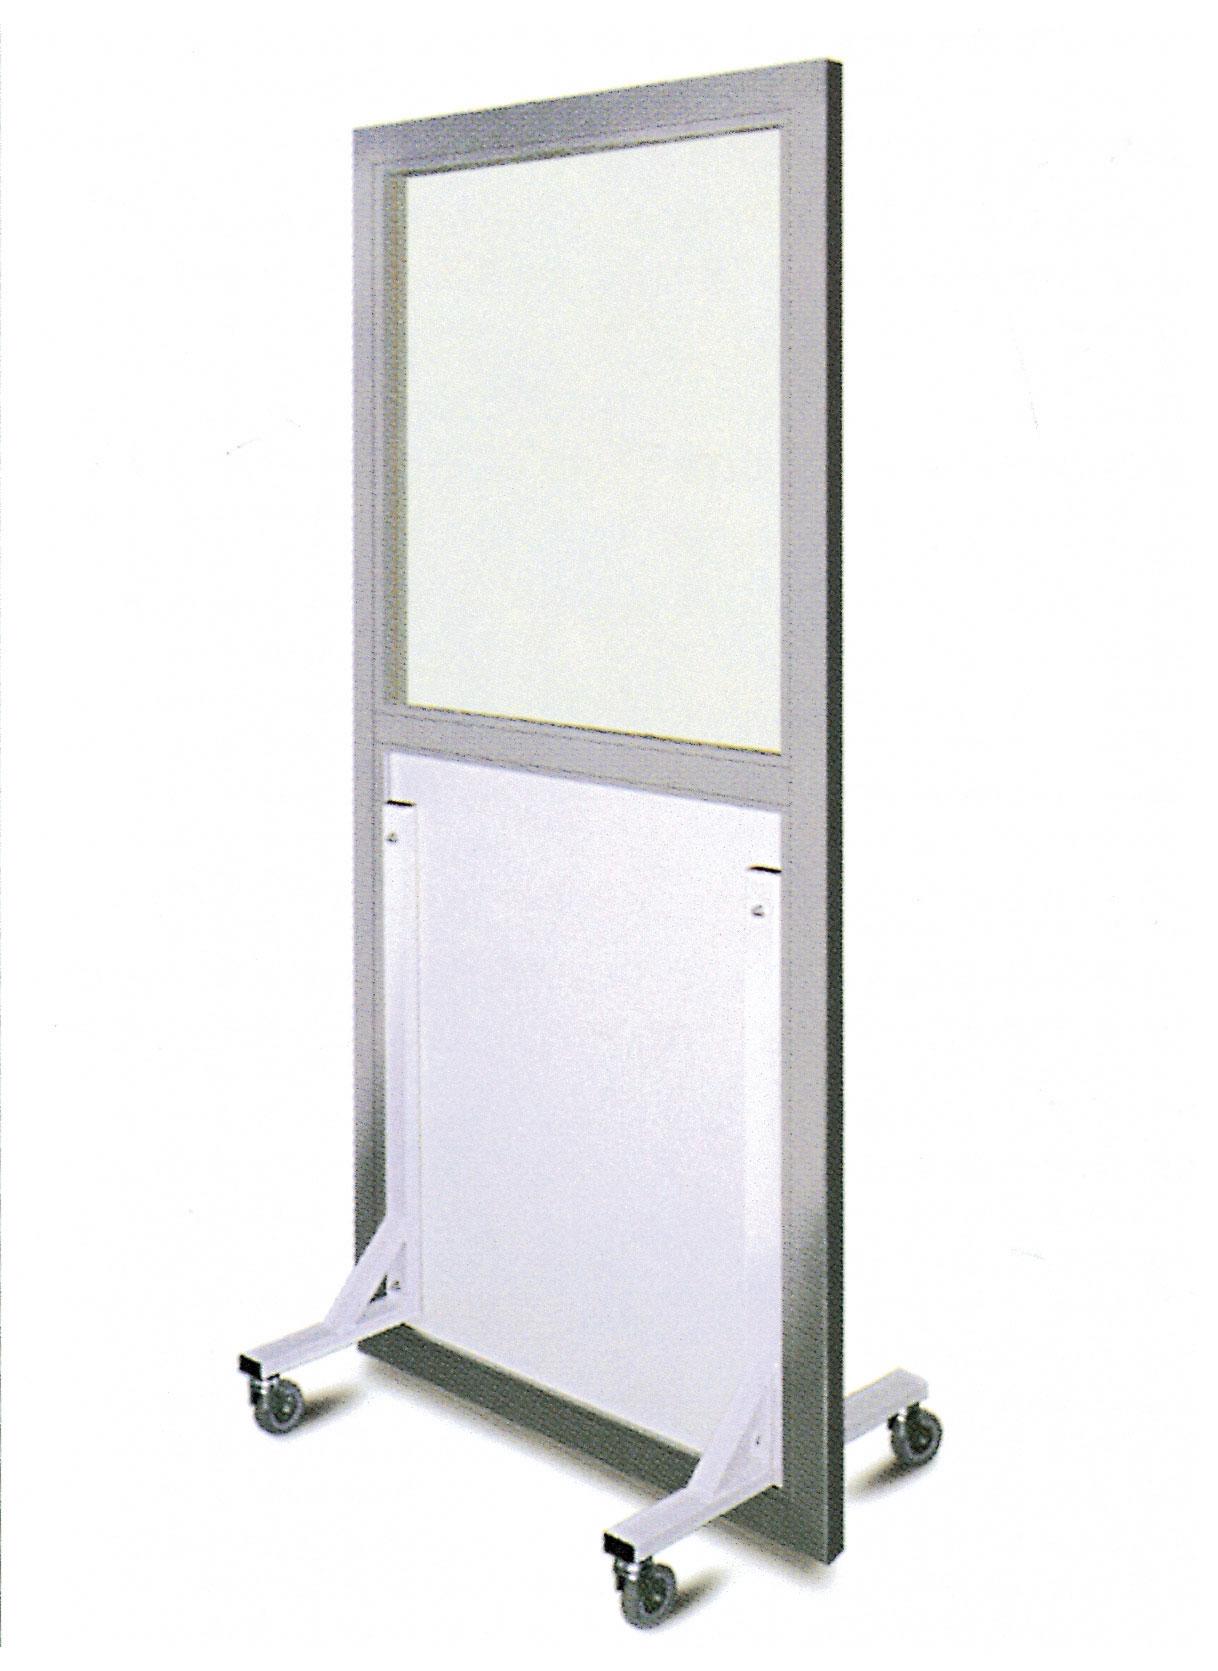 Mobile shield with lead glass CABLAS